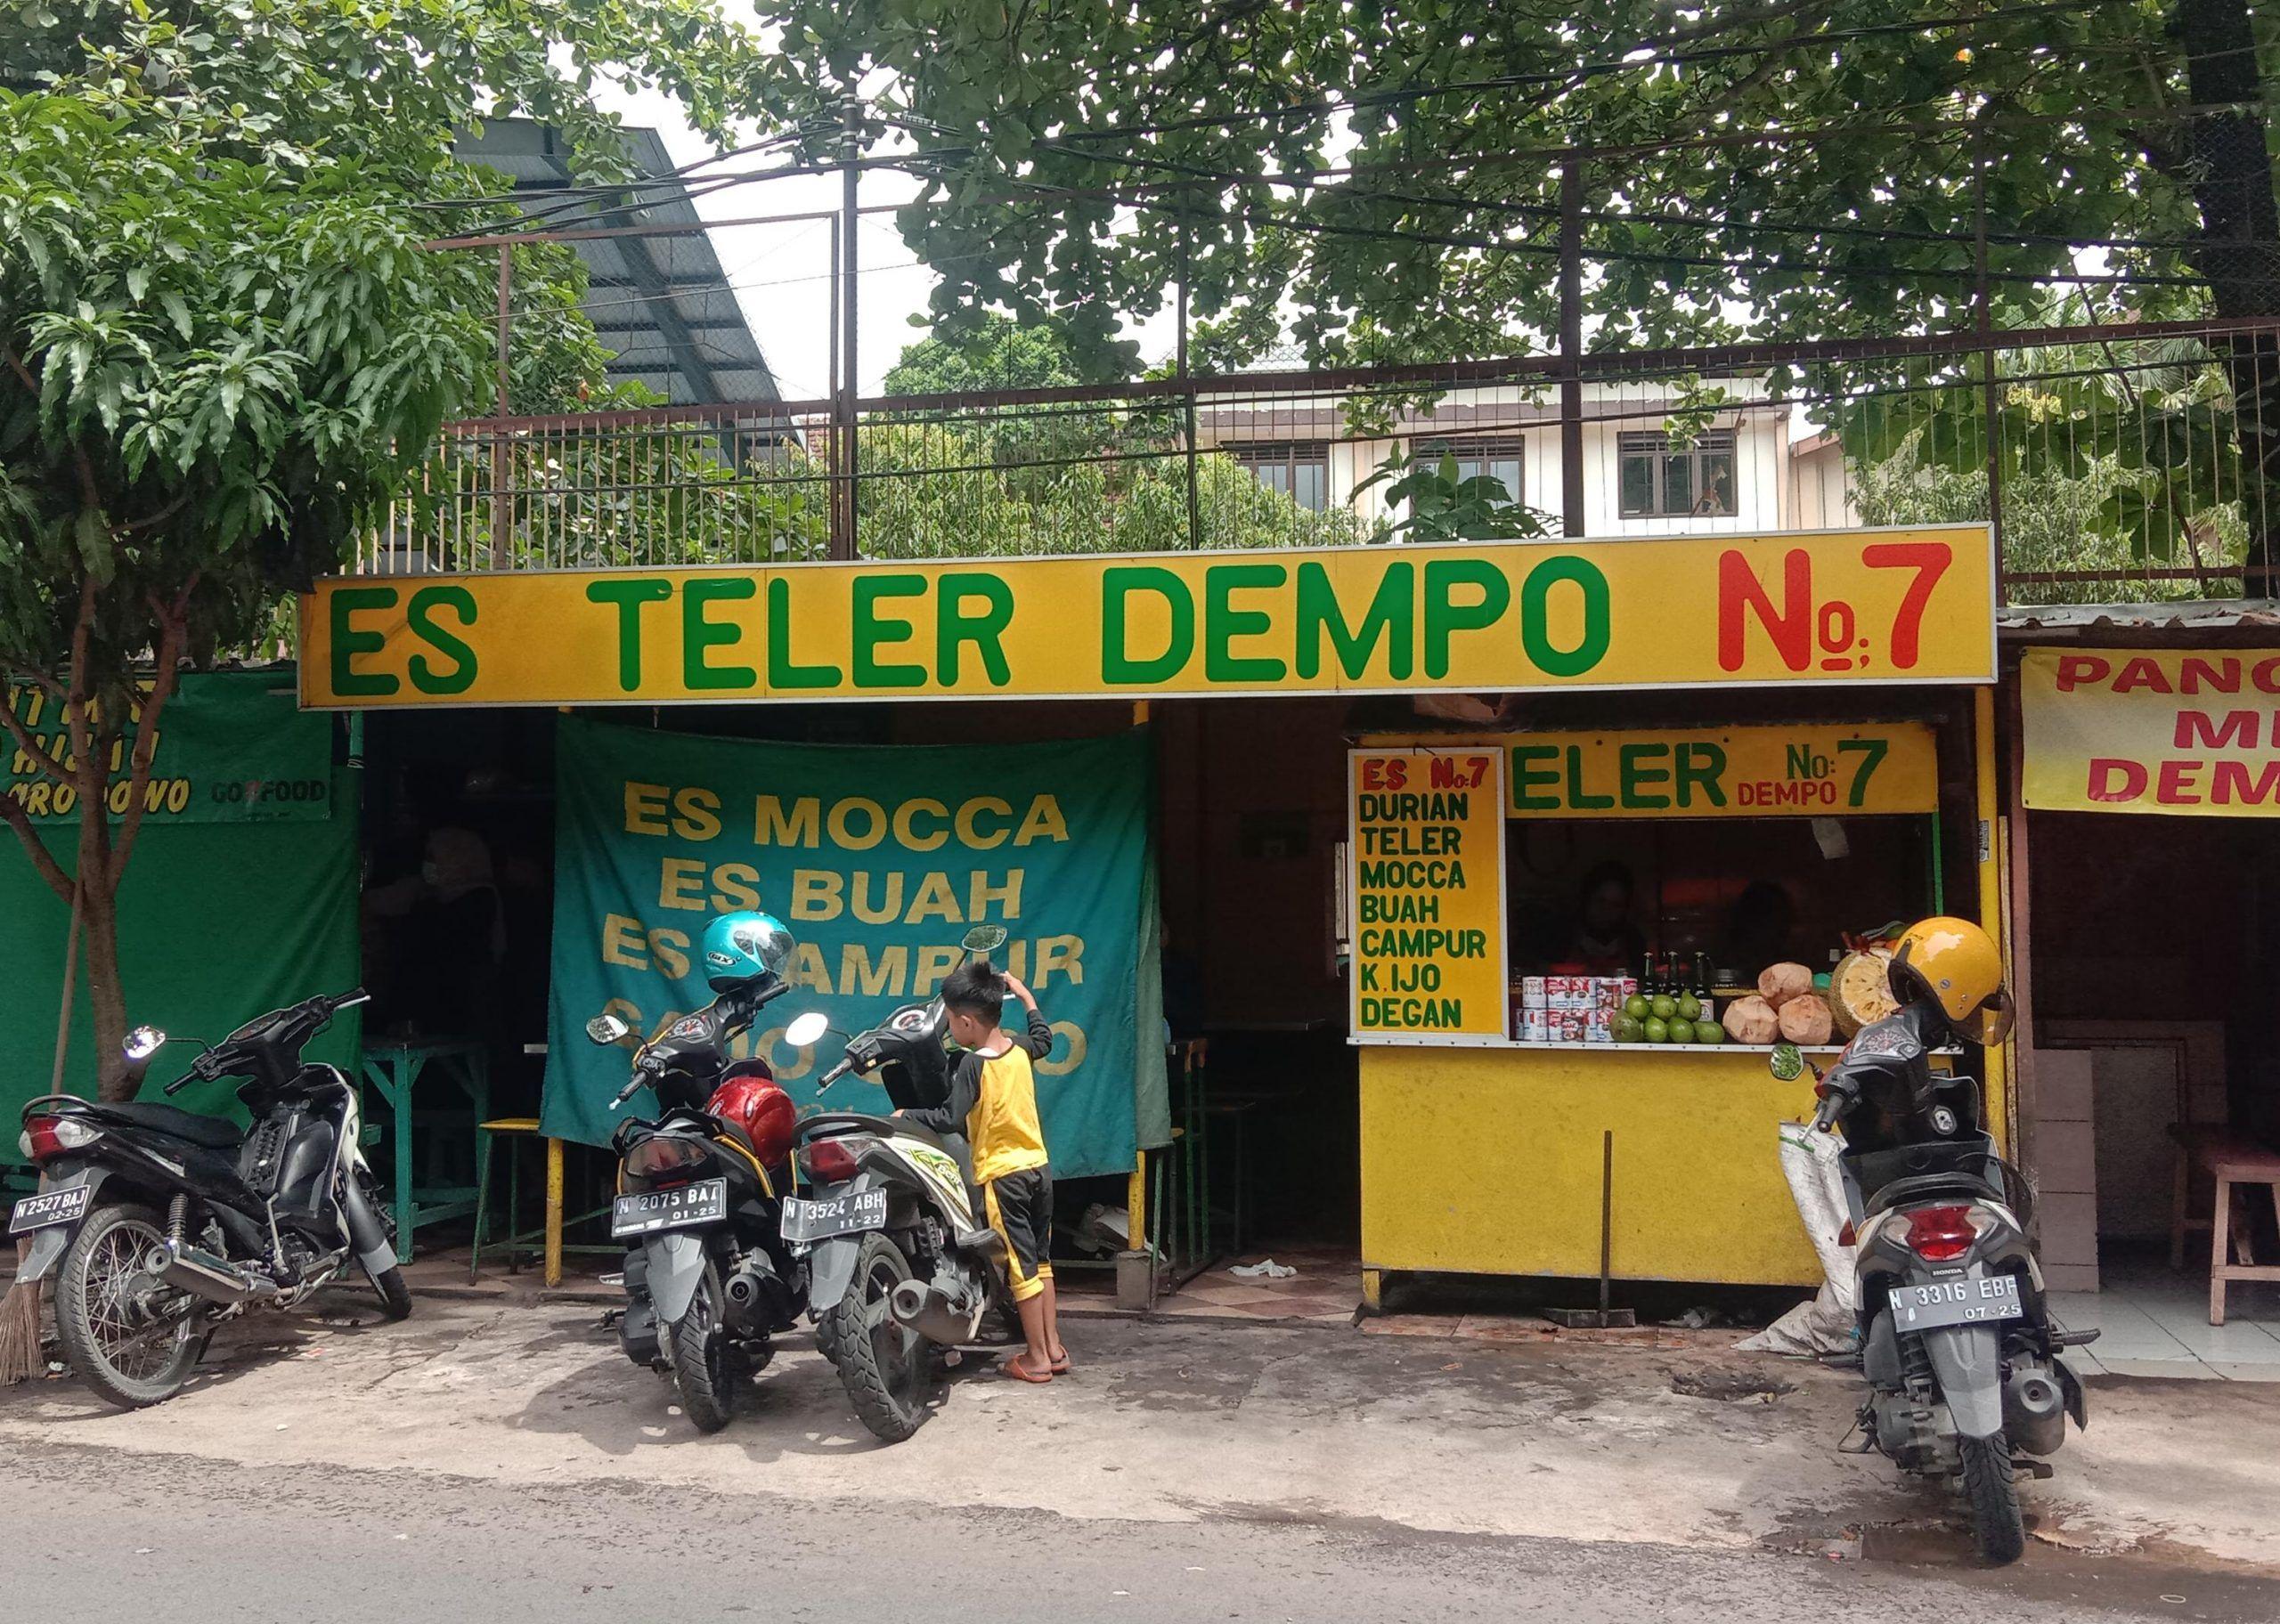 Kedai Es Teler Dempo No 7 yang begitu legendaris di Kota Malang. (Foto: Feni/Tugu Malang/Tugu Jatim)